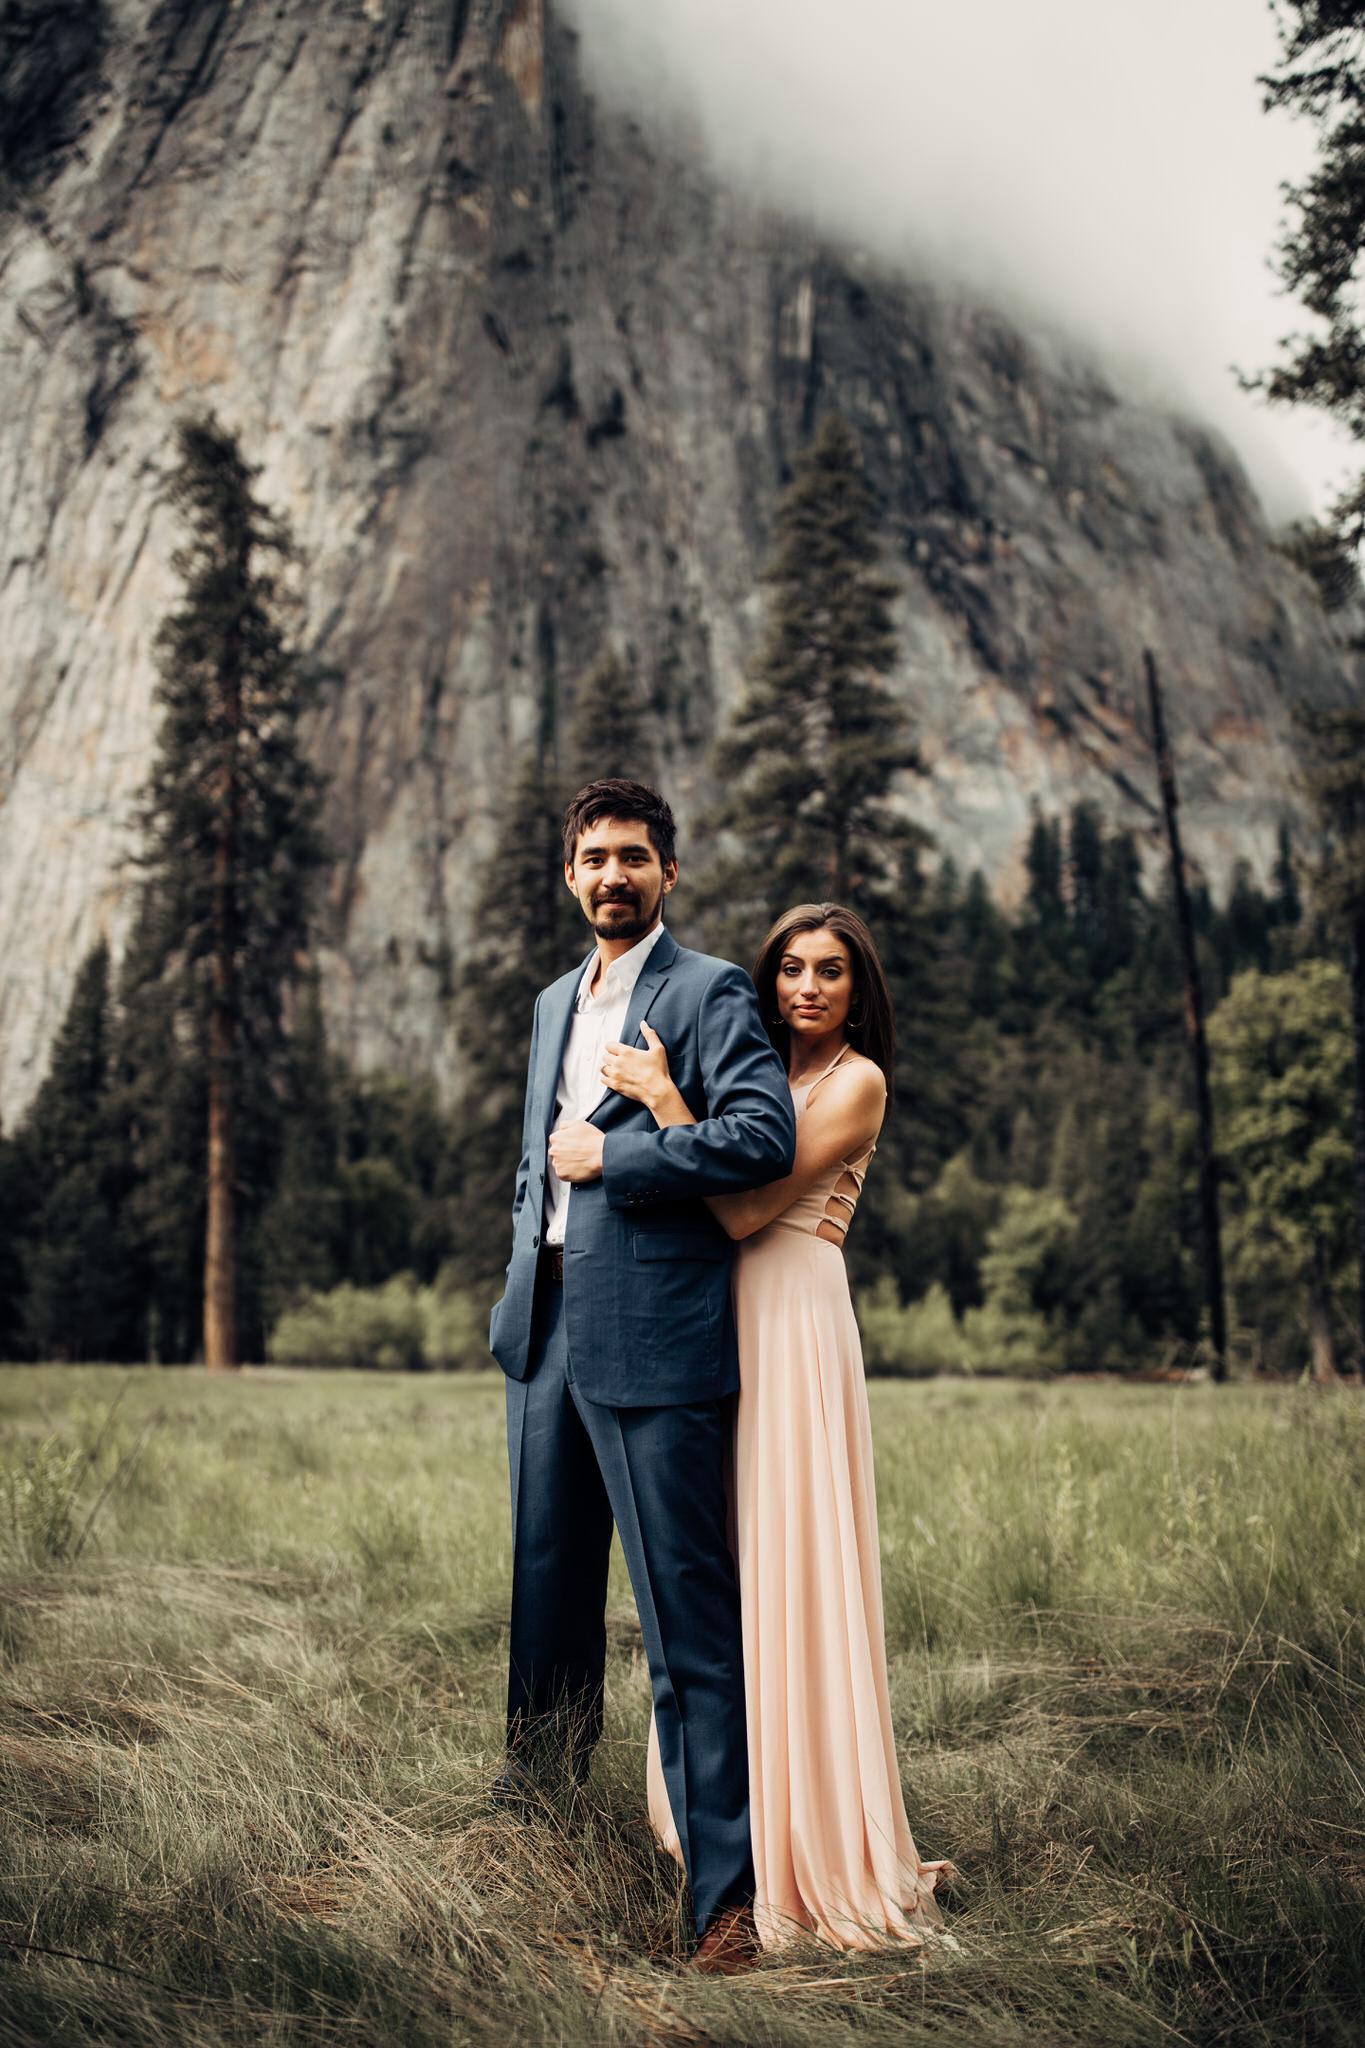 Yosemite-engagement-session-lauren-and-tom72.jpg